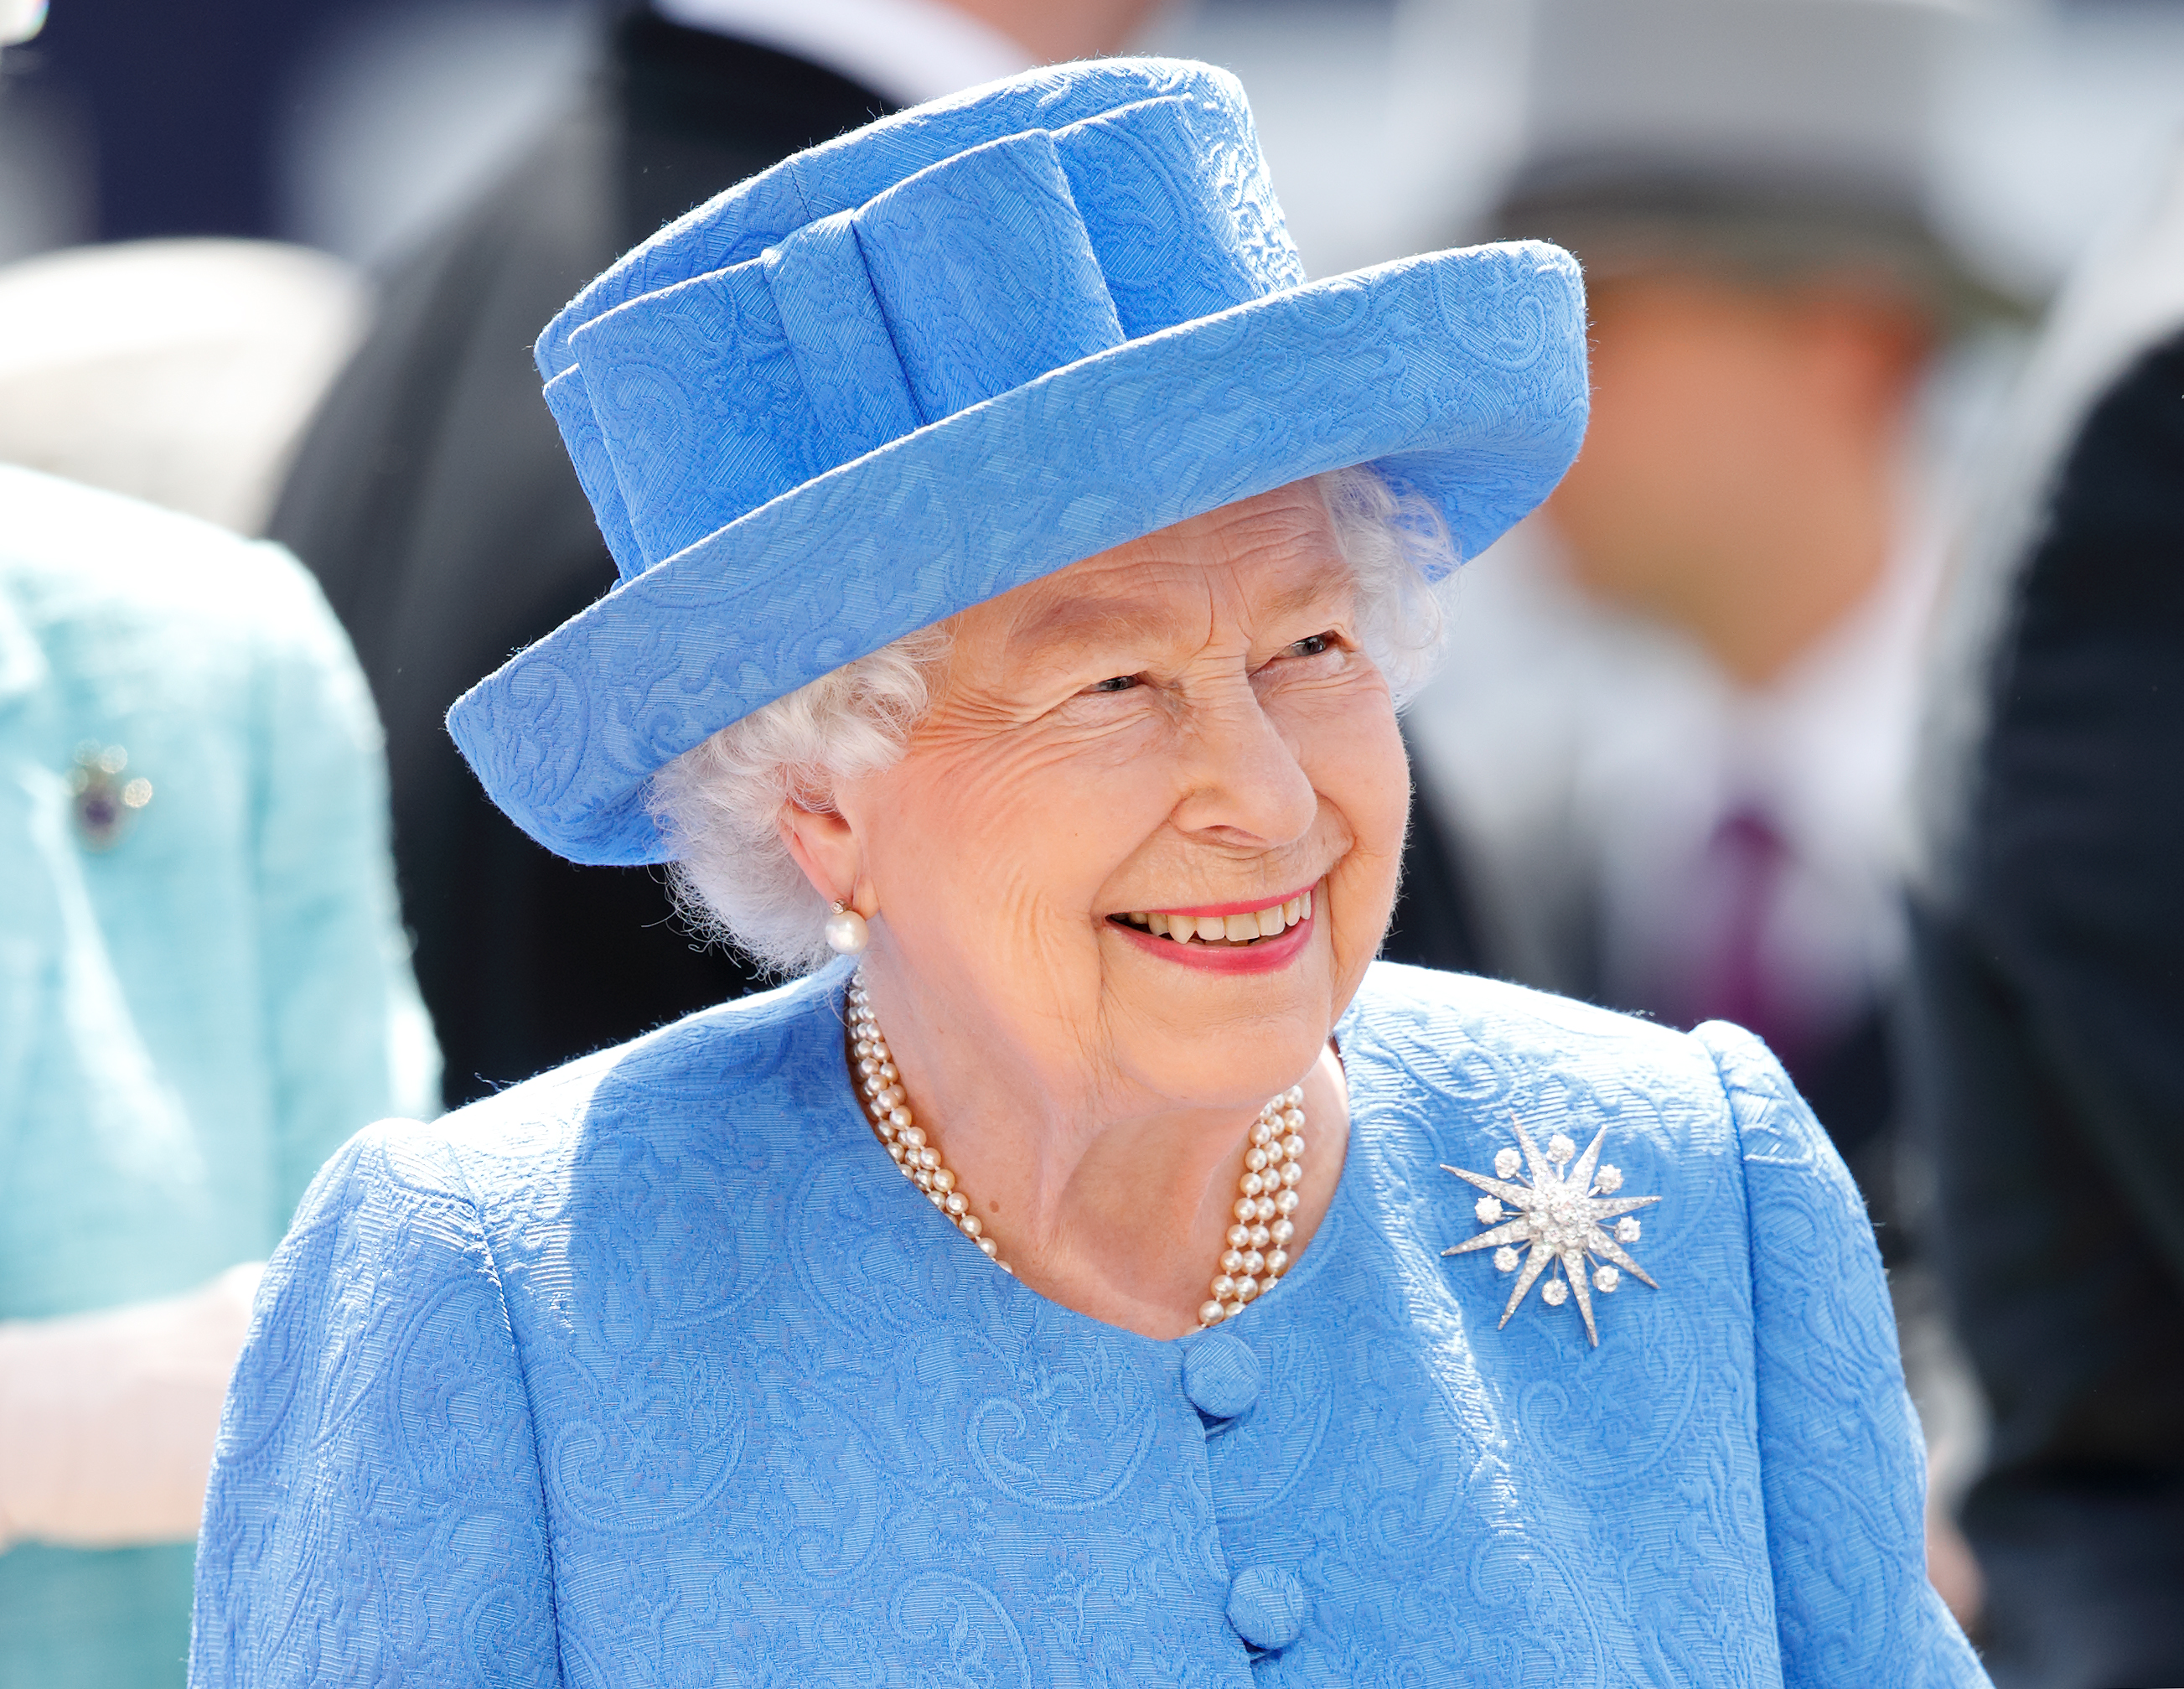 Queen Elizabeth II Celebrates 90th Birthday at Windsor